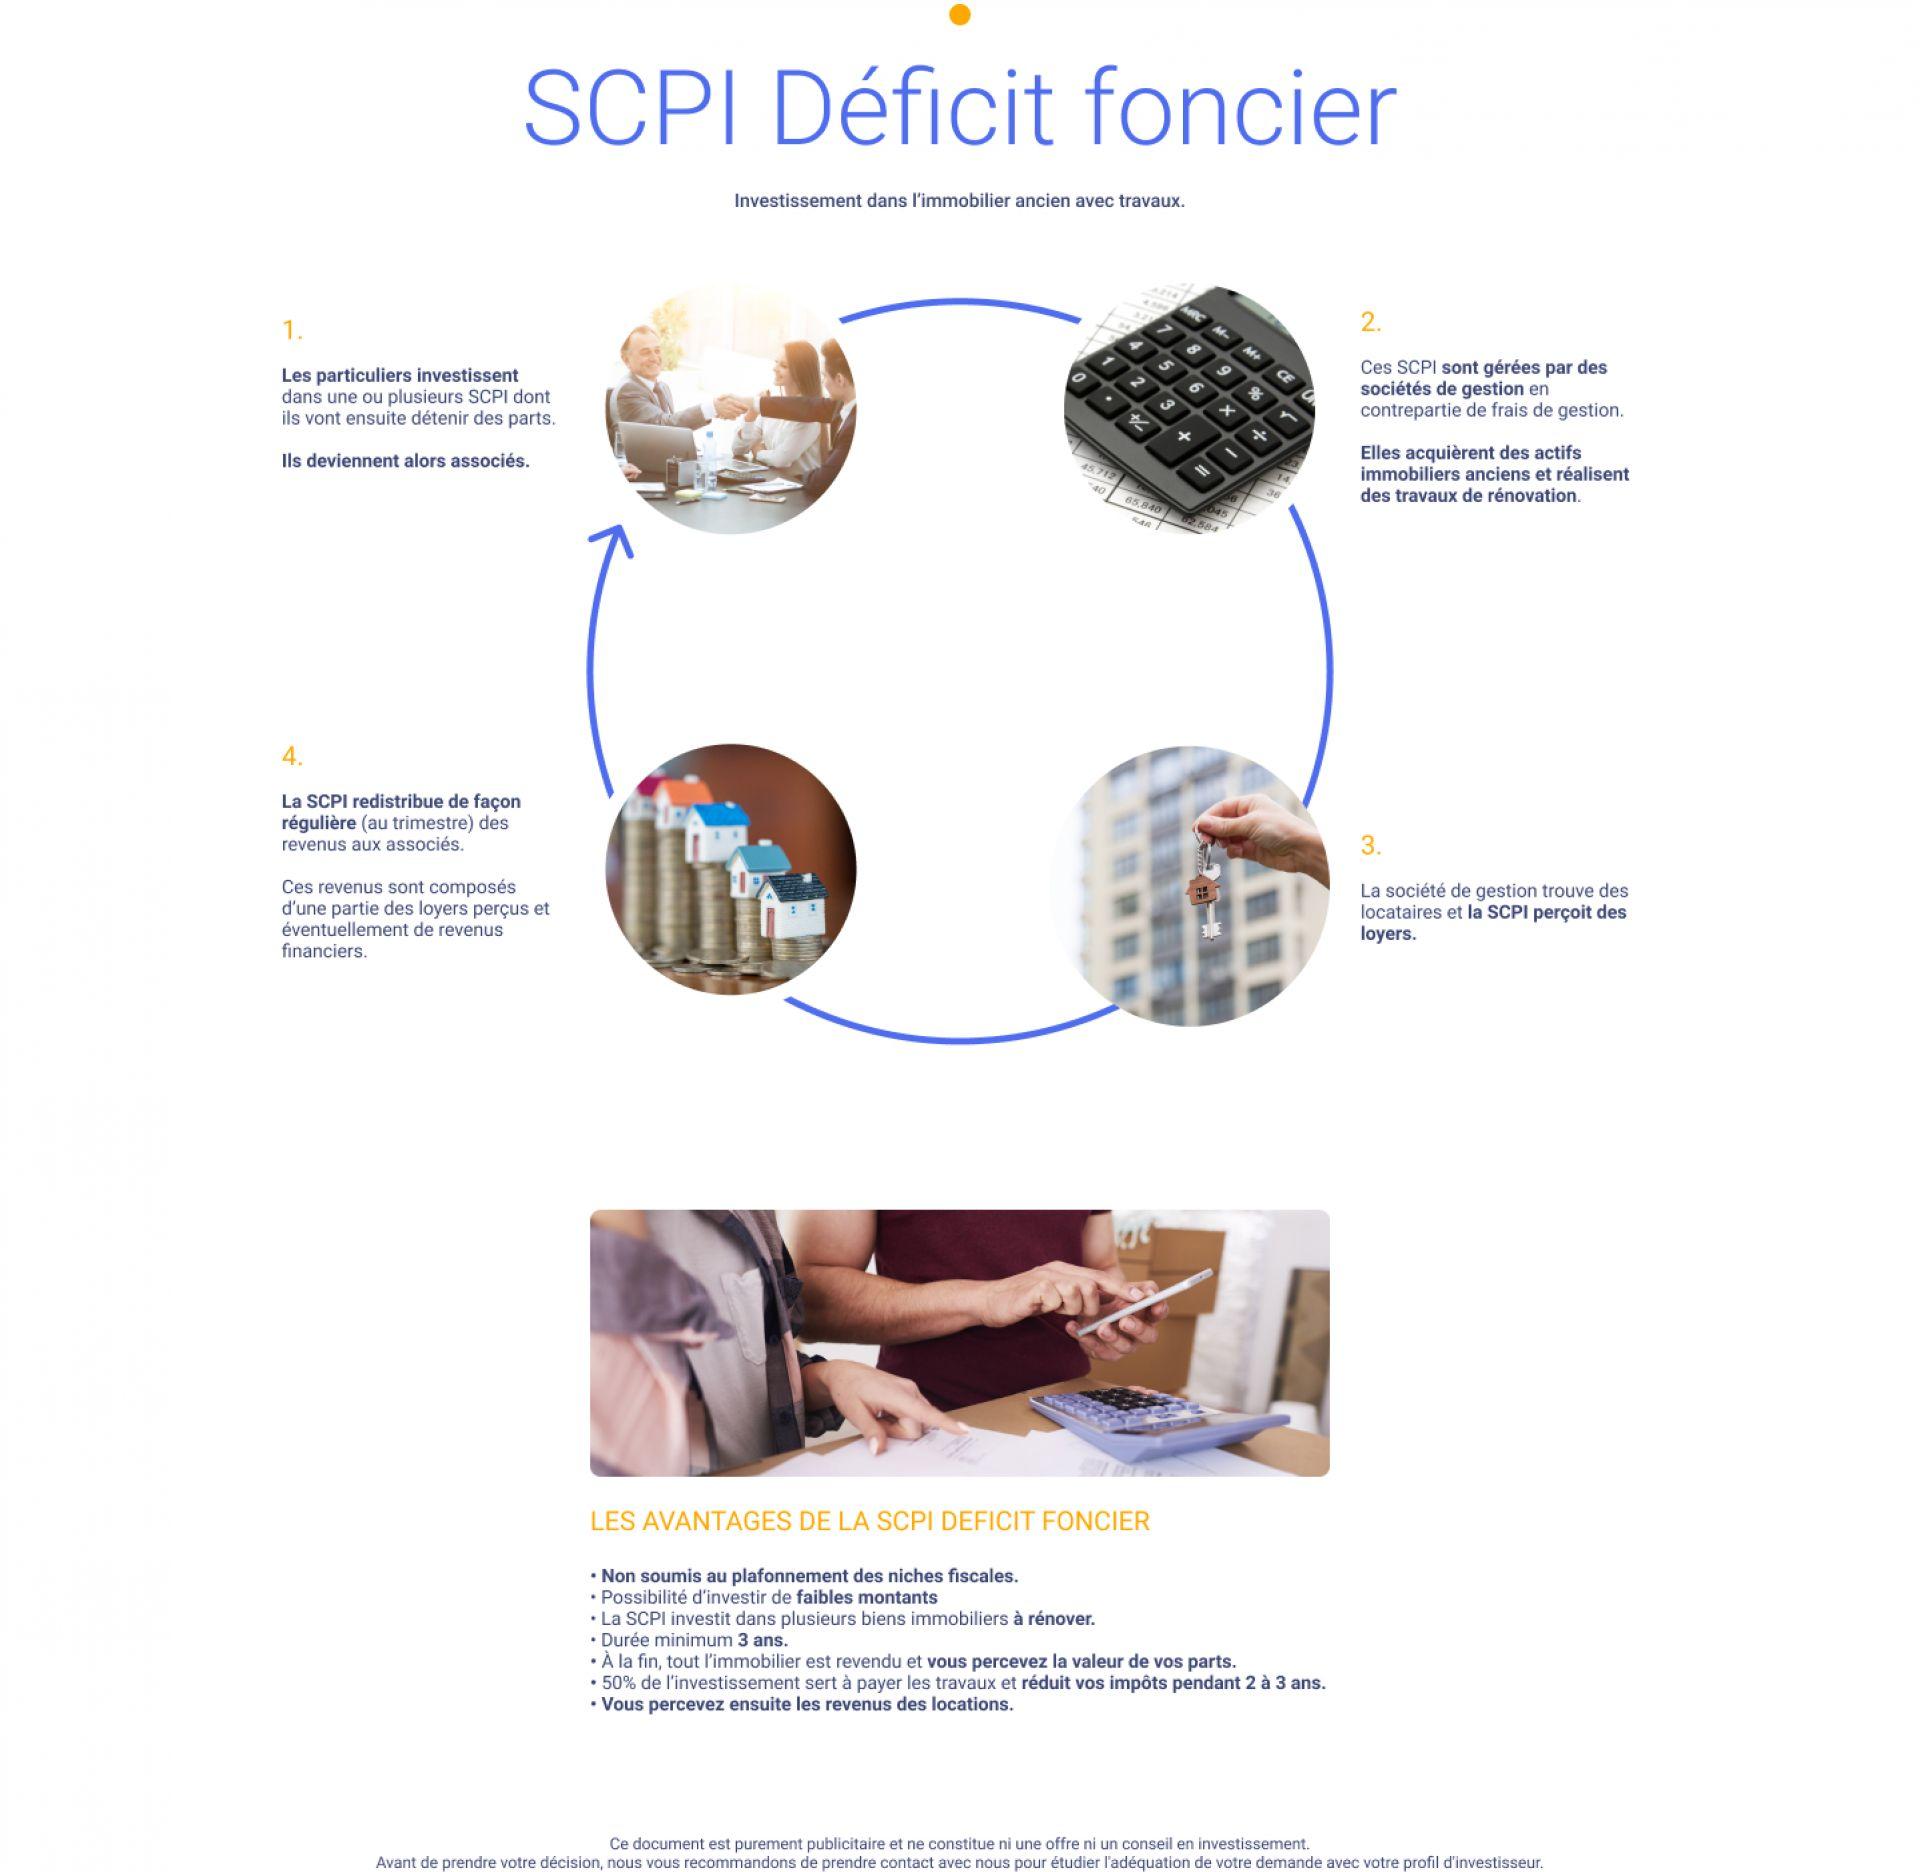 SCPI Deficit Foncier - Image 2